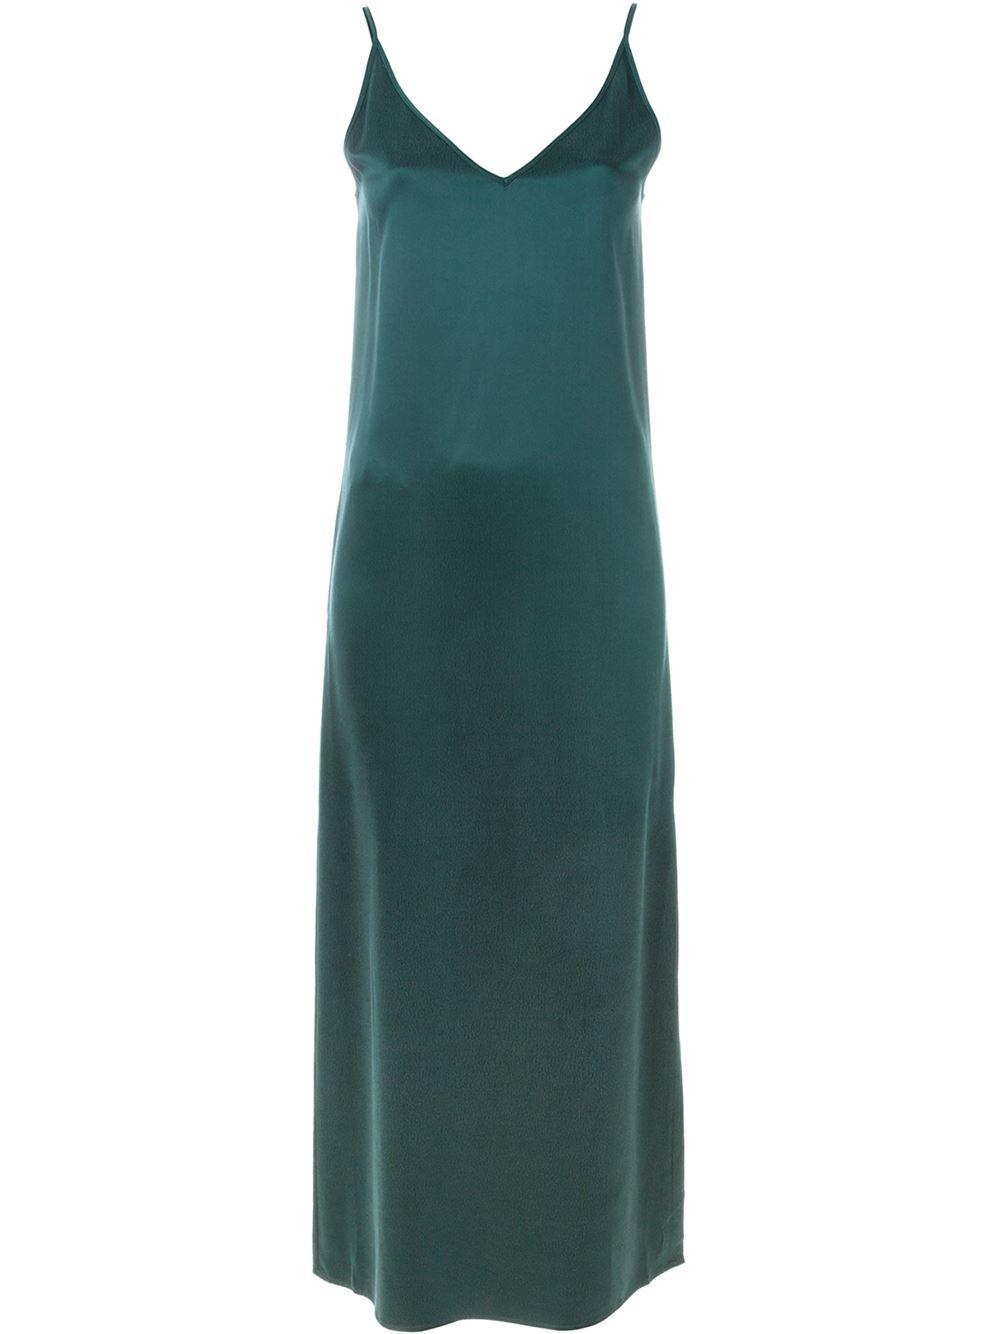 'Raquel' Slip Dress